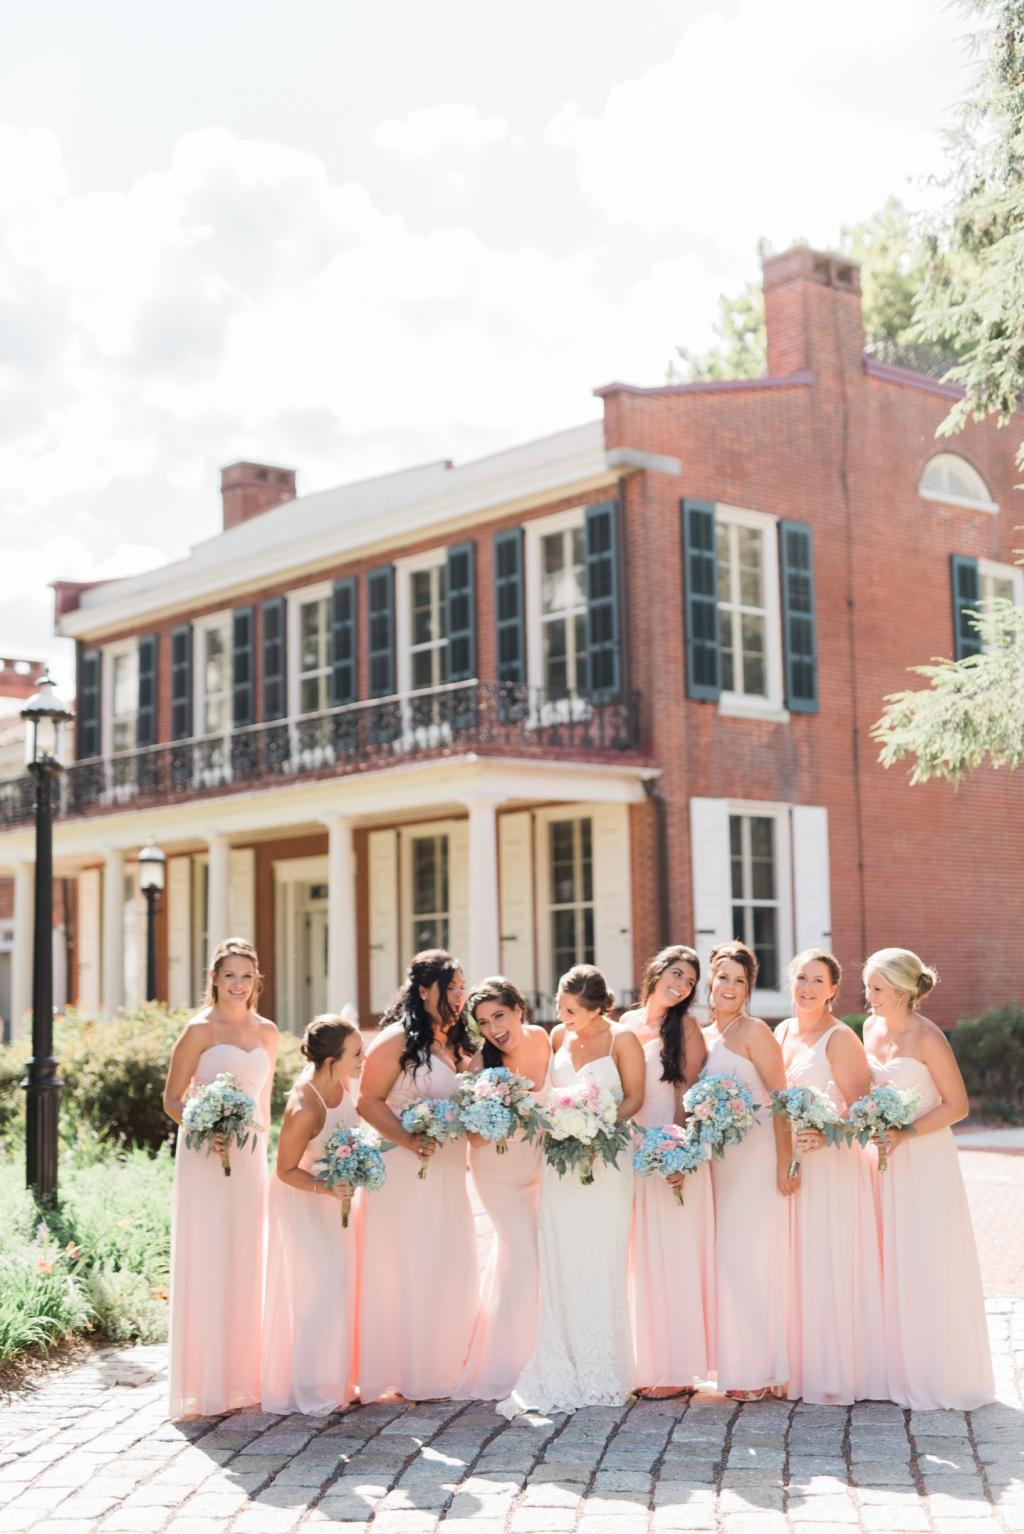 haley-richter-photography-buena-vista-confrence-center-wedding-summer-028